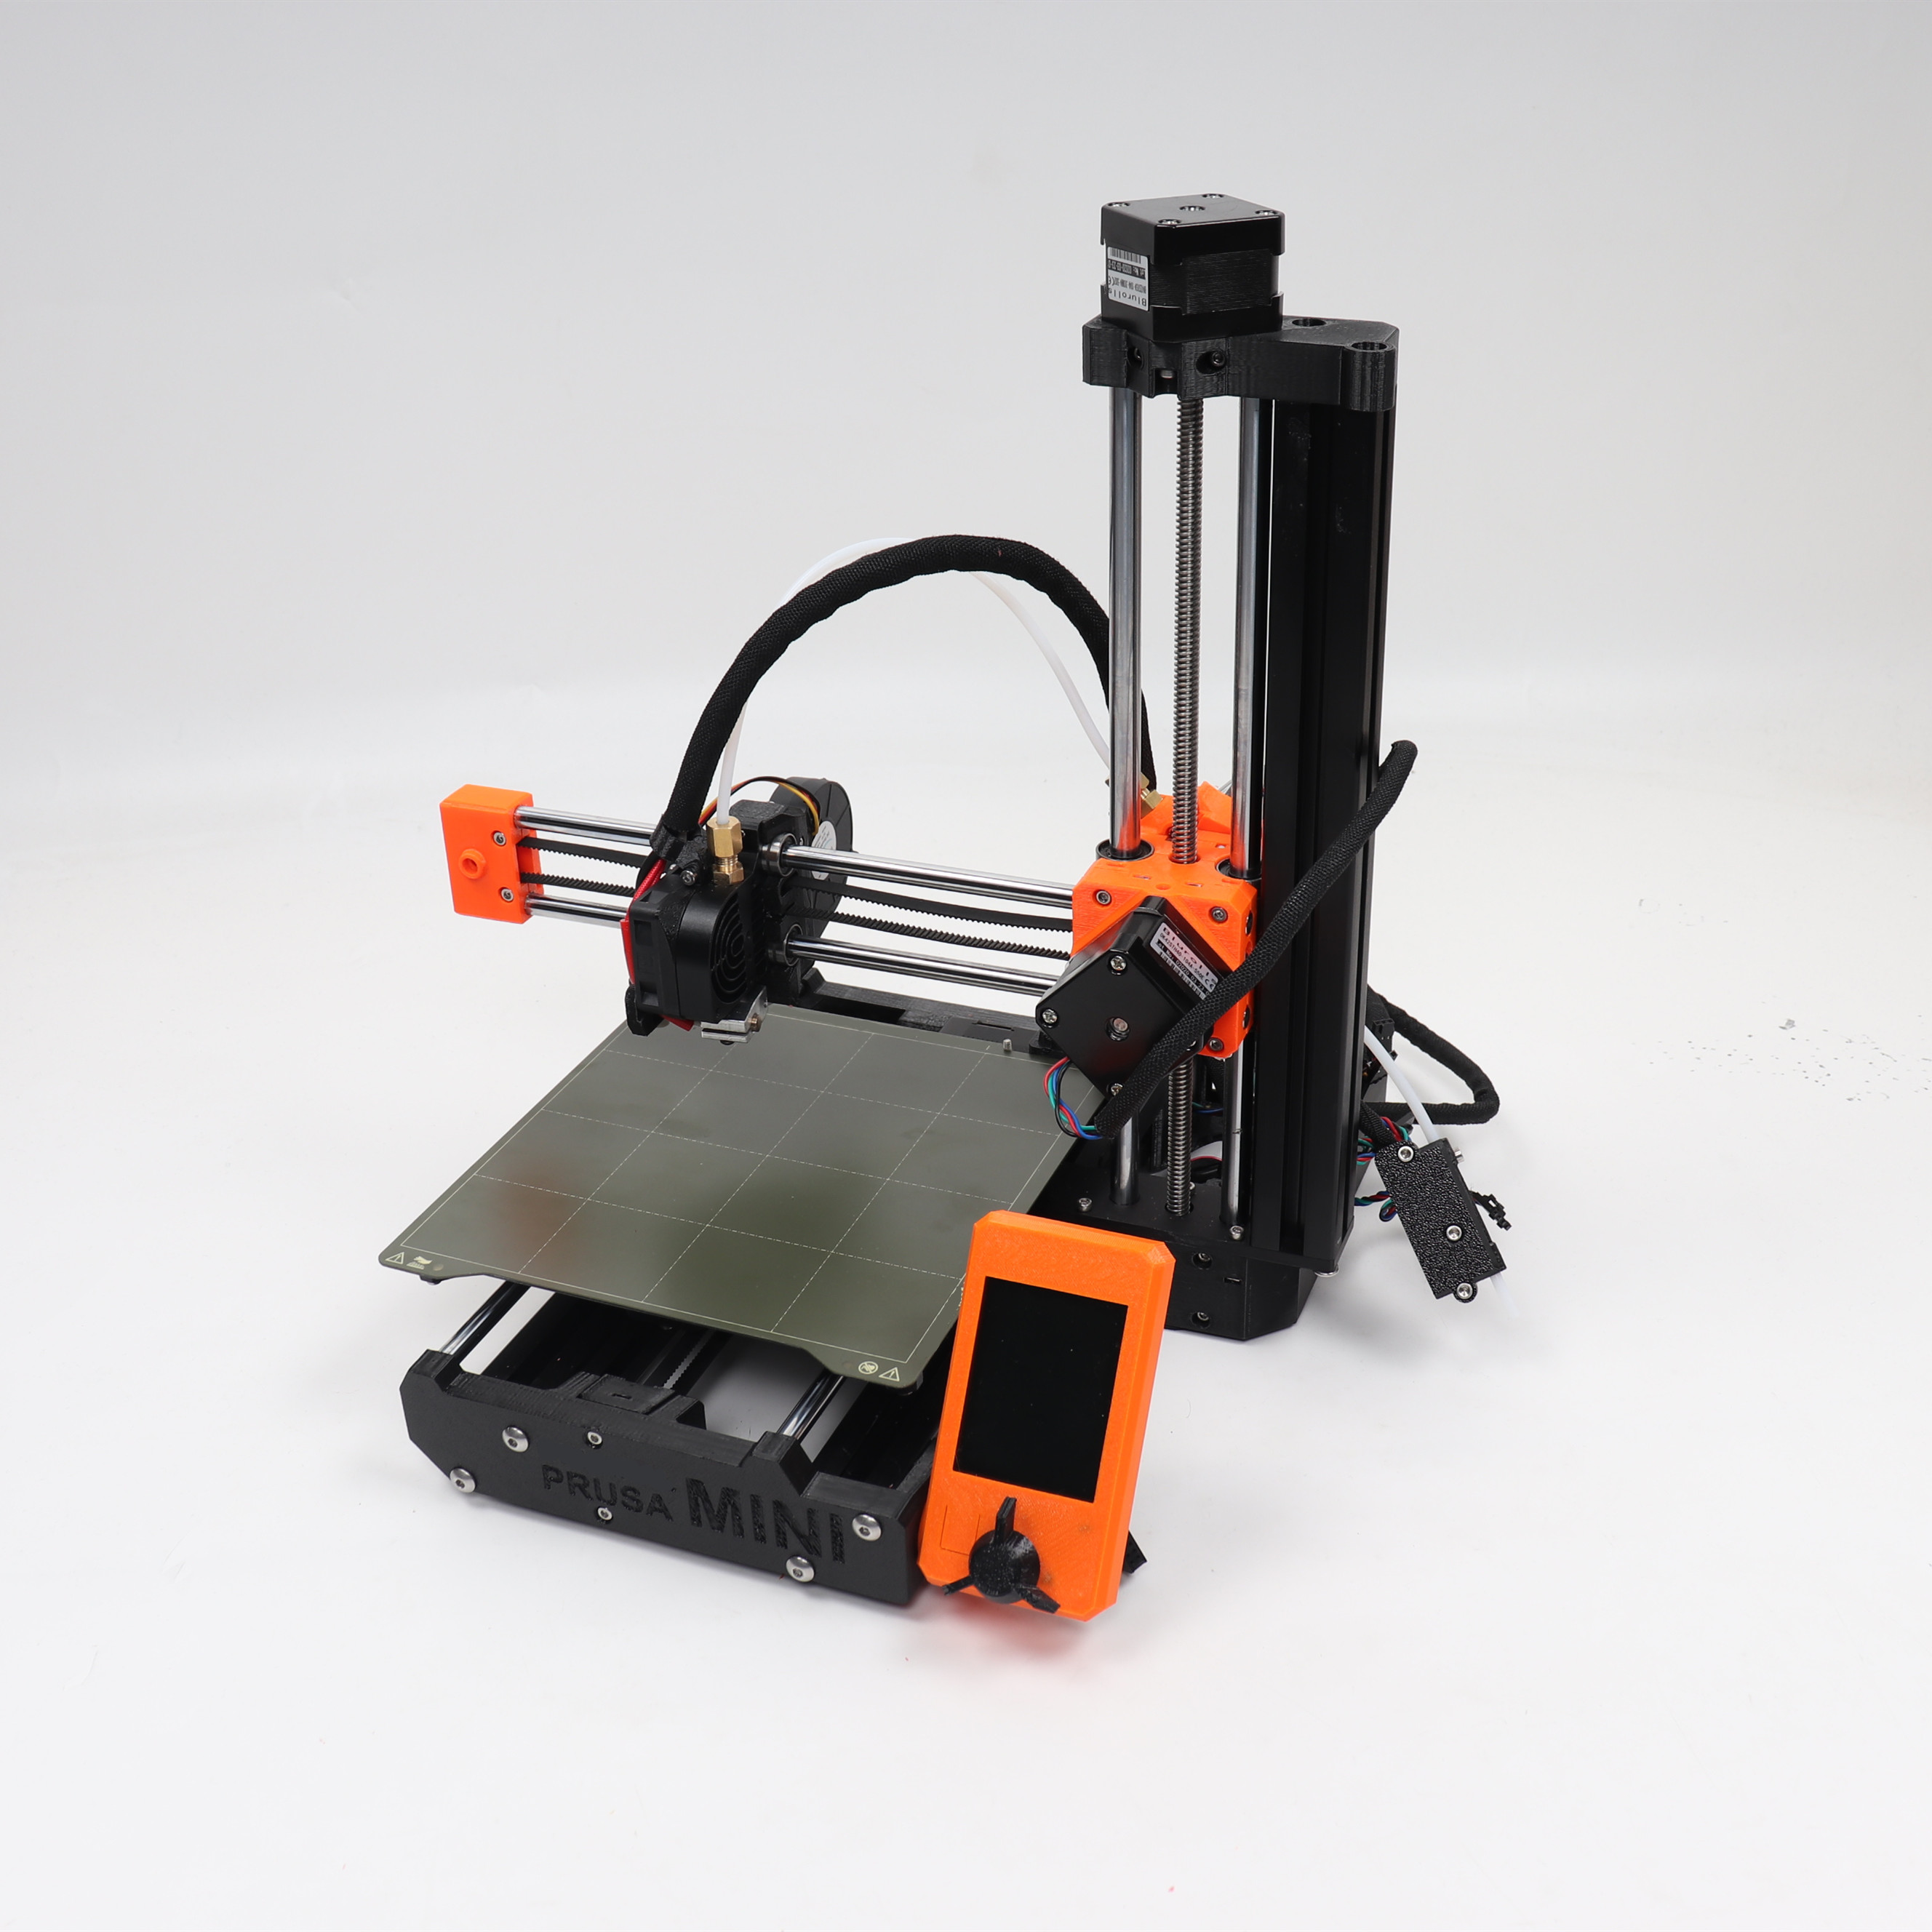 Prusa Mini 3d Printer DIY Full Kit Including Meanswell PSU Sunon Fan,filament Sensor  Pre-order(not Assembled)